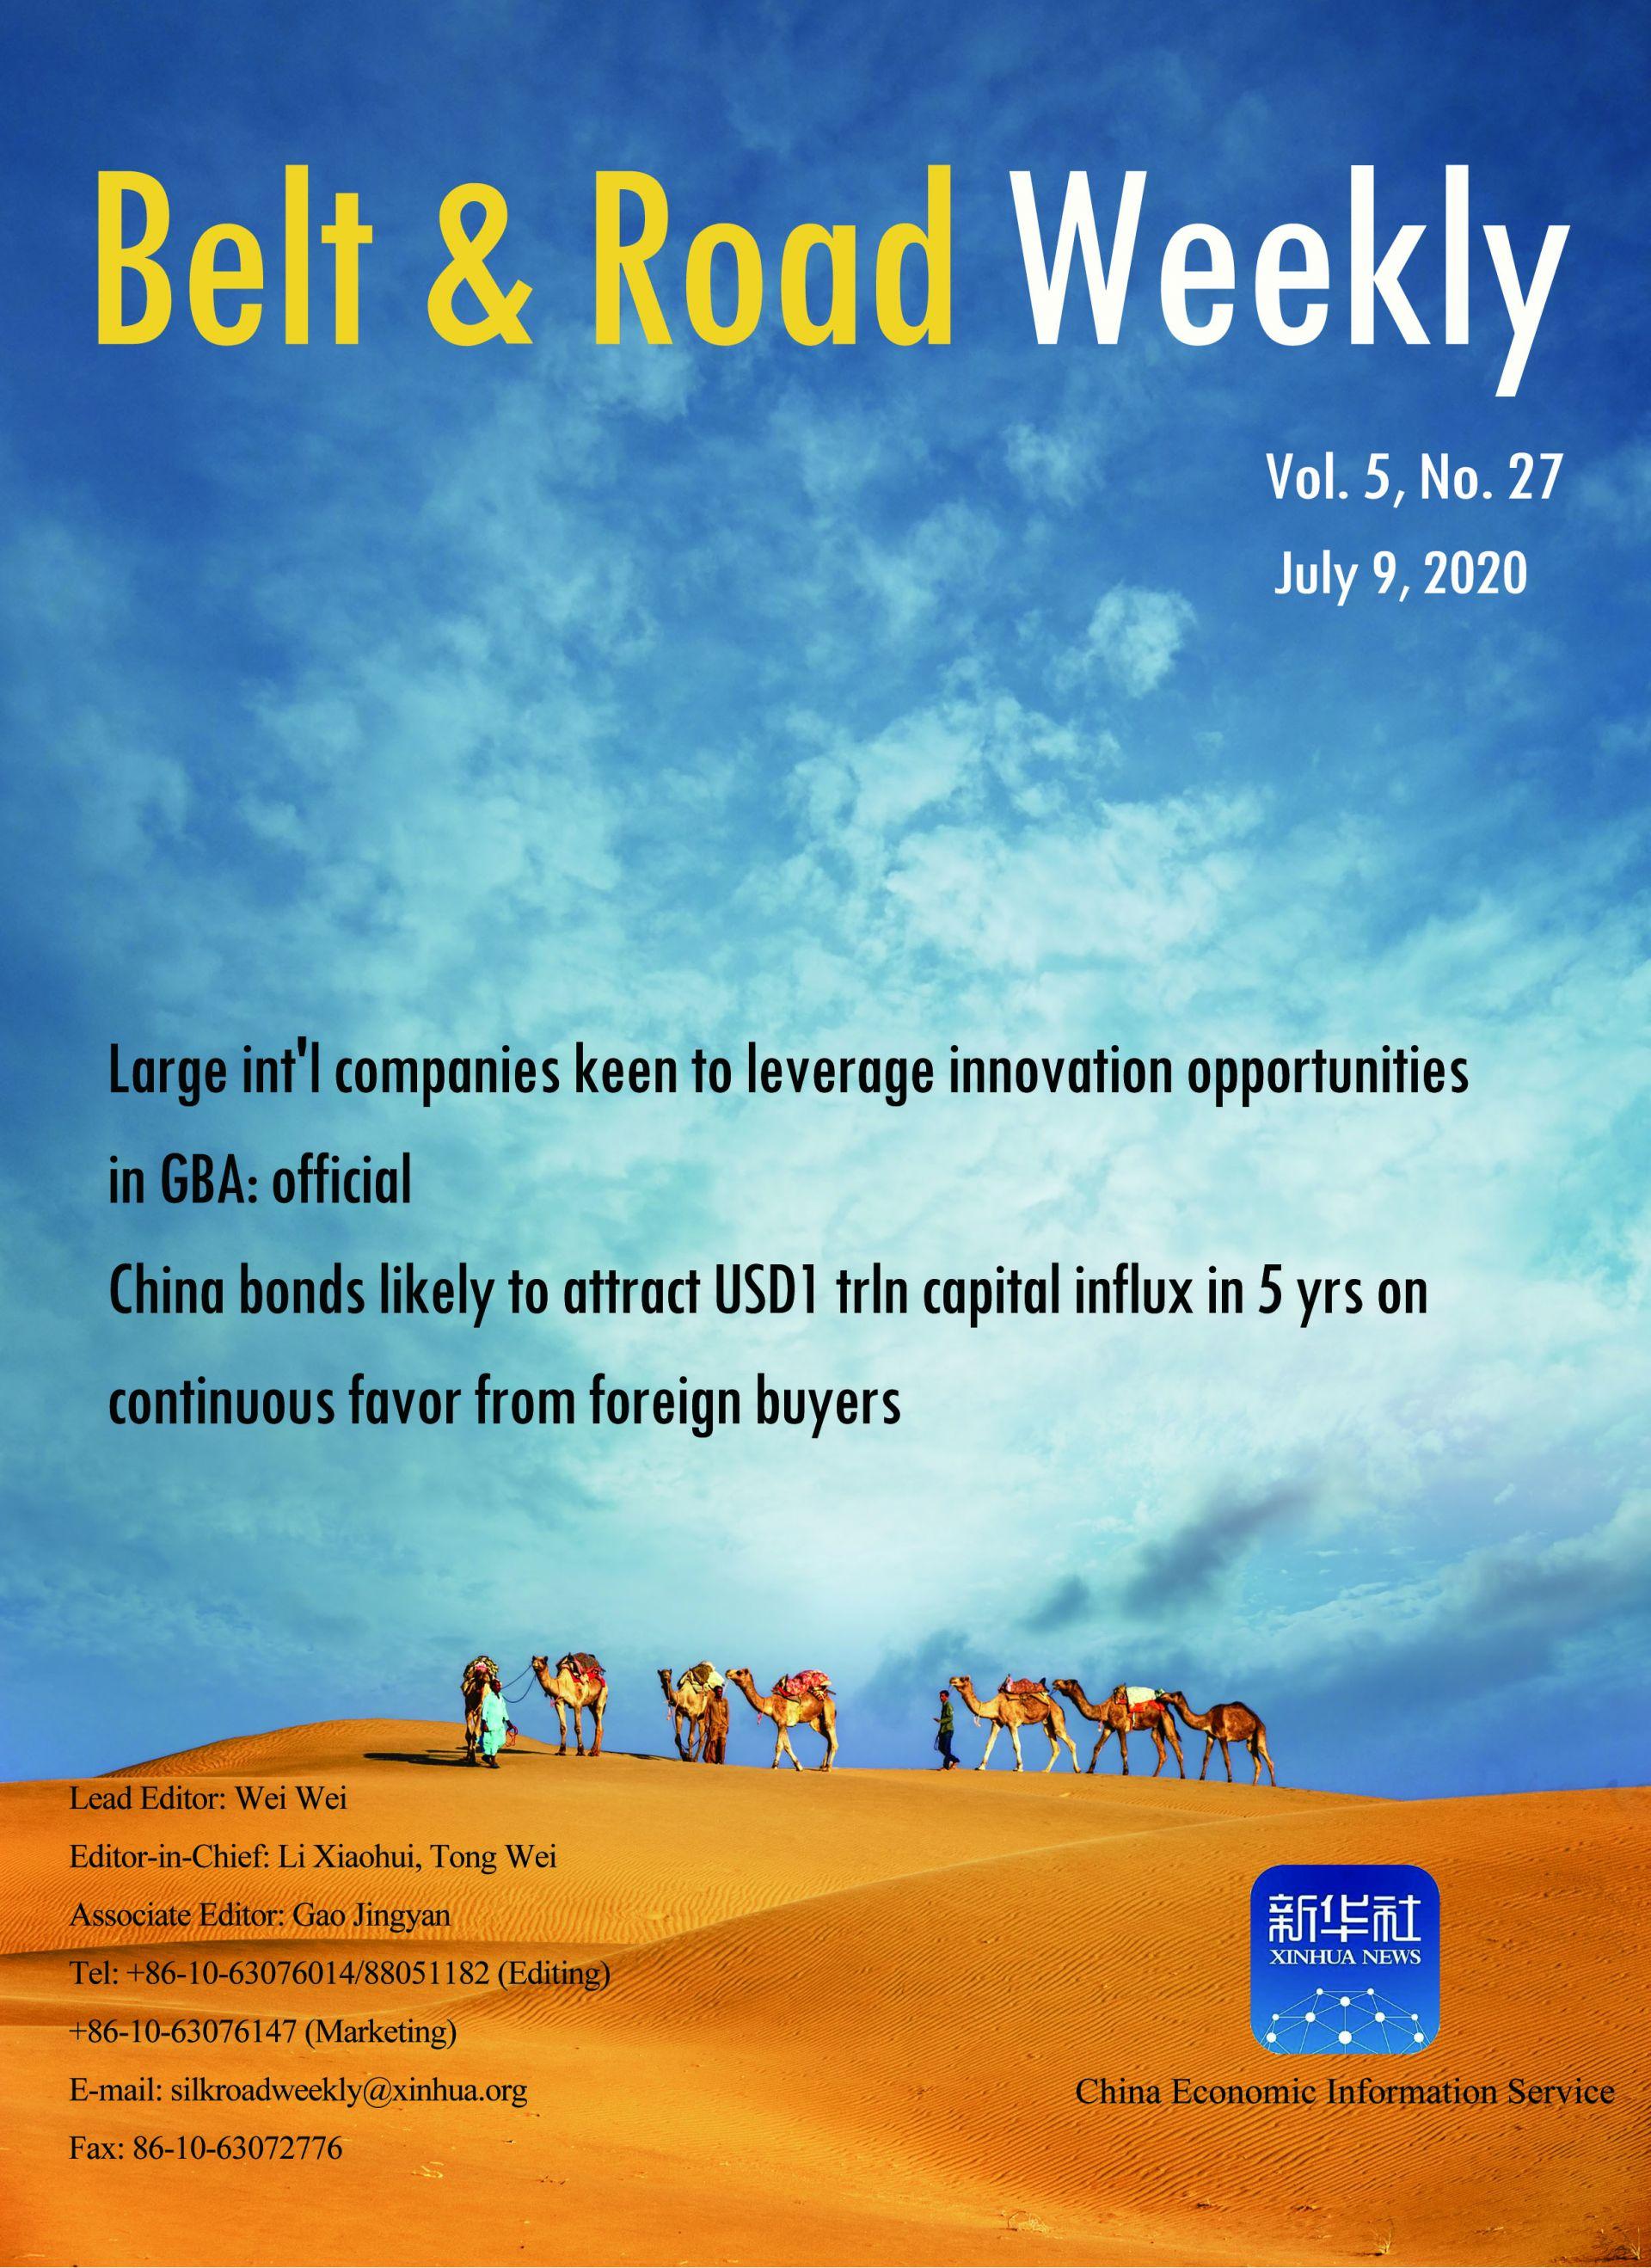 Belt and Road Weekly Vol. 5 No. 27